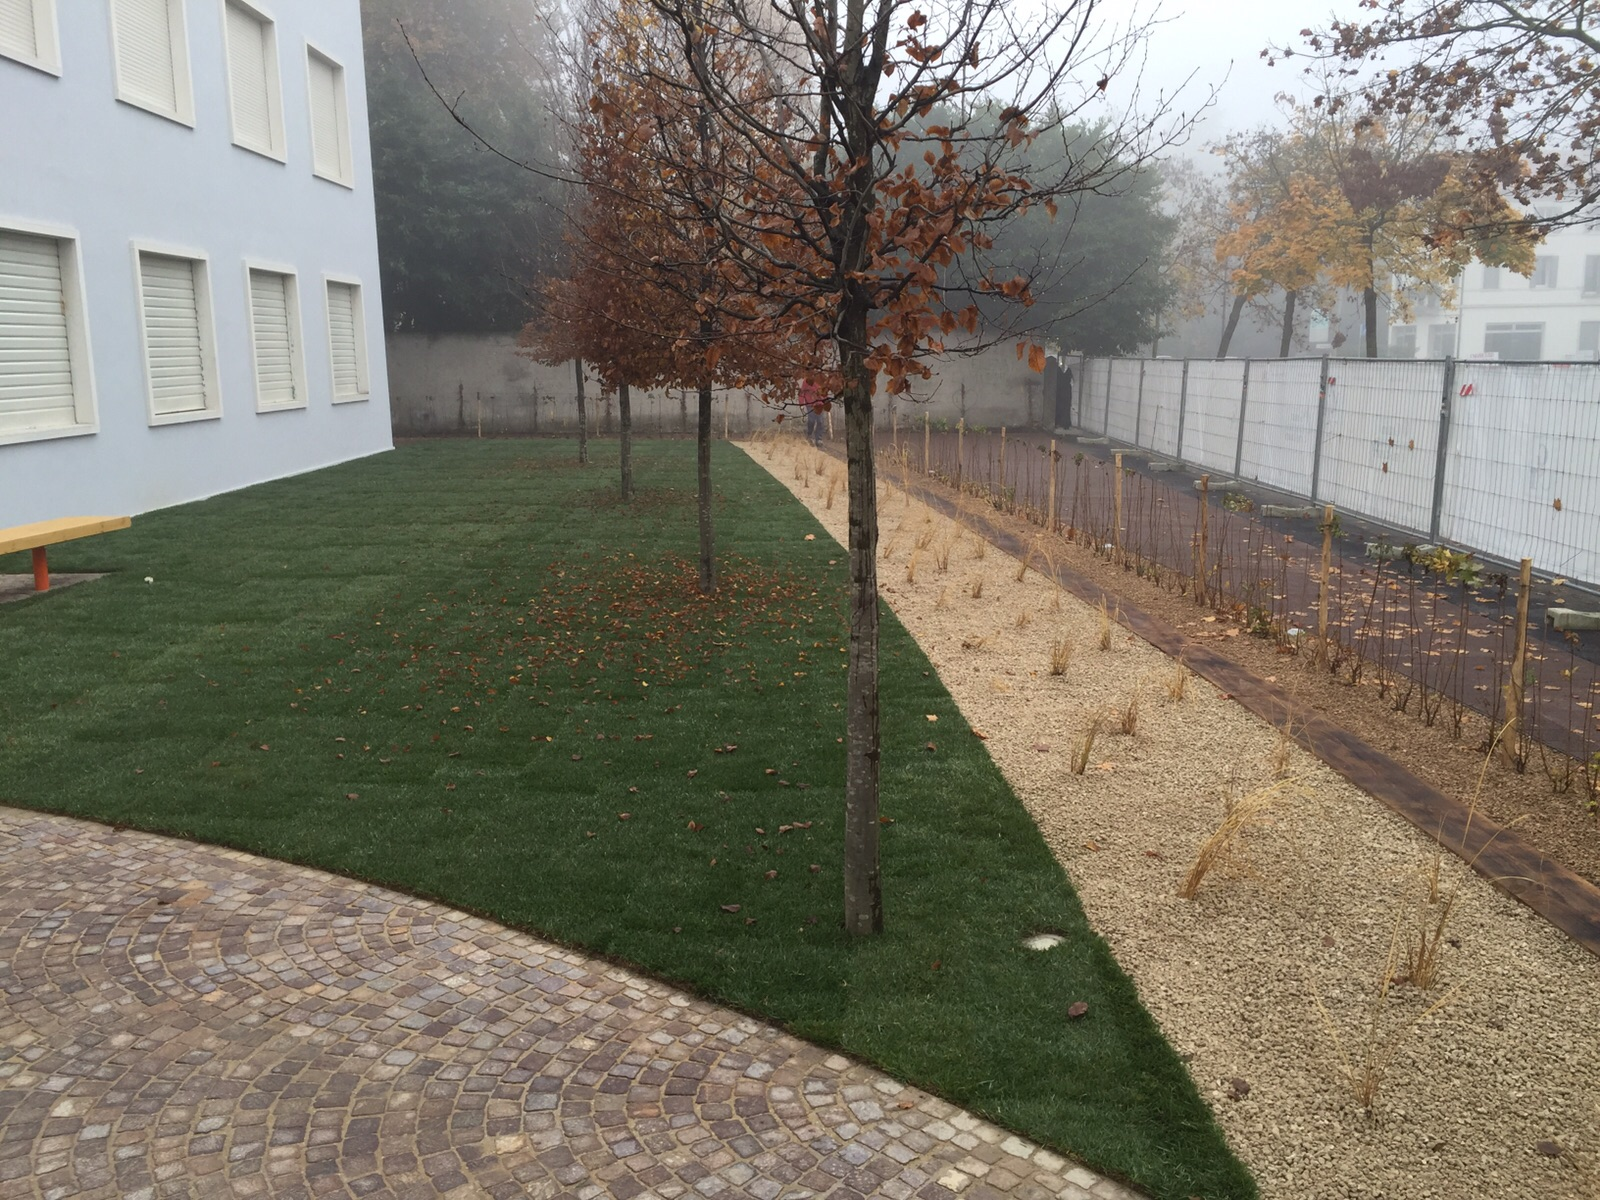 Teatro_Alcuni_giardino_nebbia